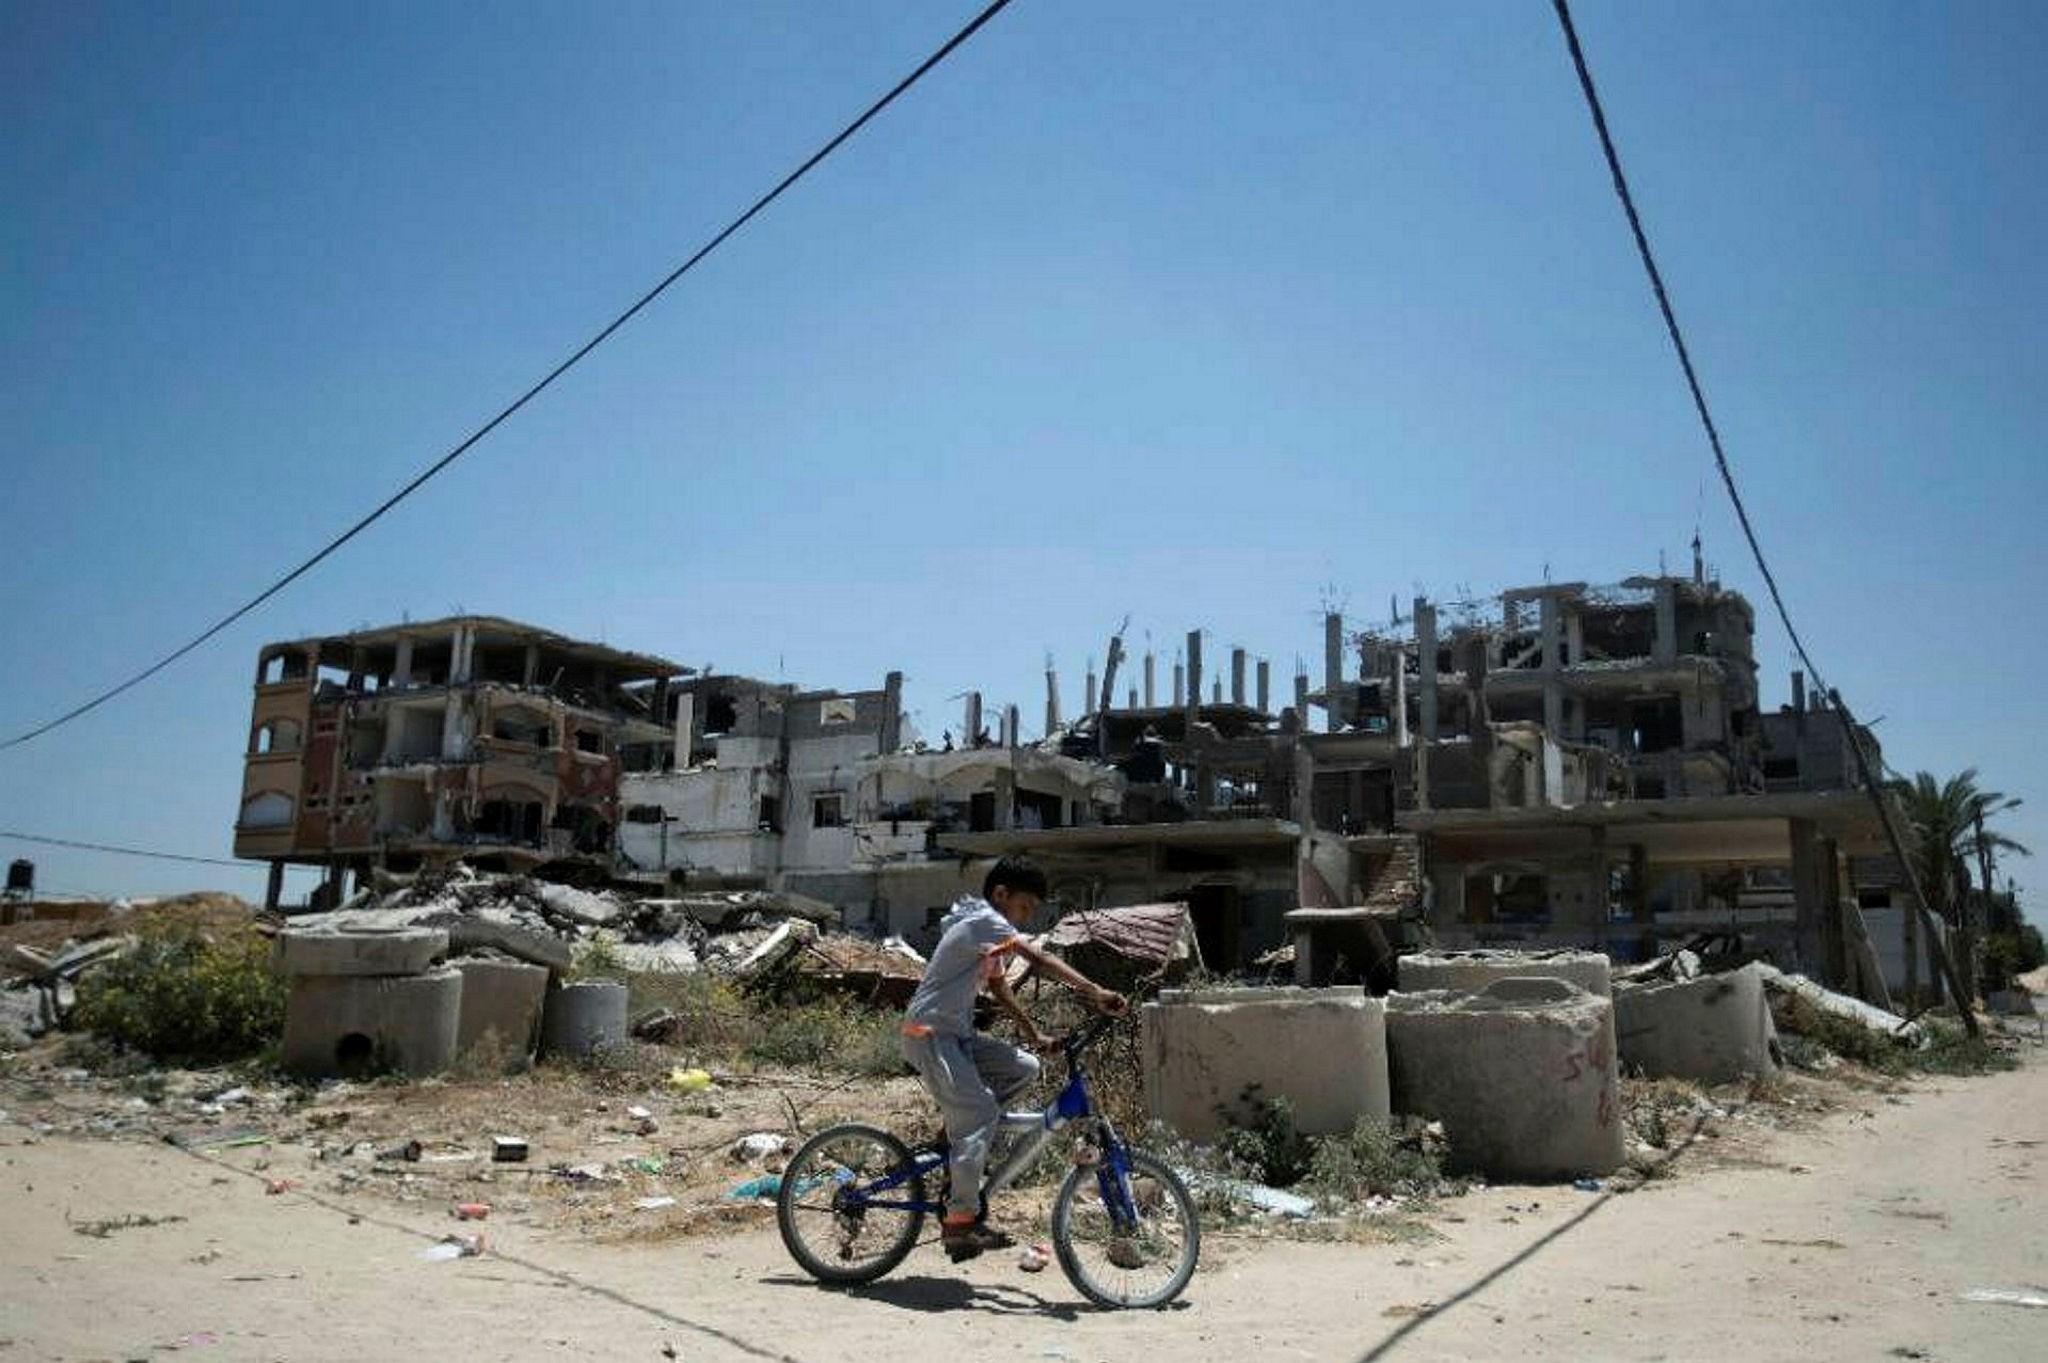 Palestinian children locked inside Gaza suffer from growing humanitarian crisis.